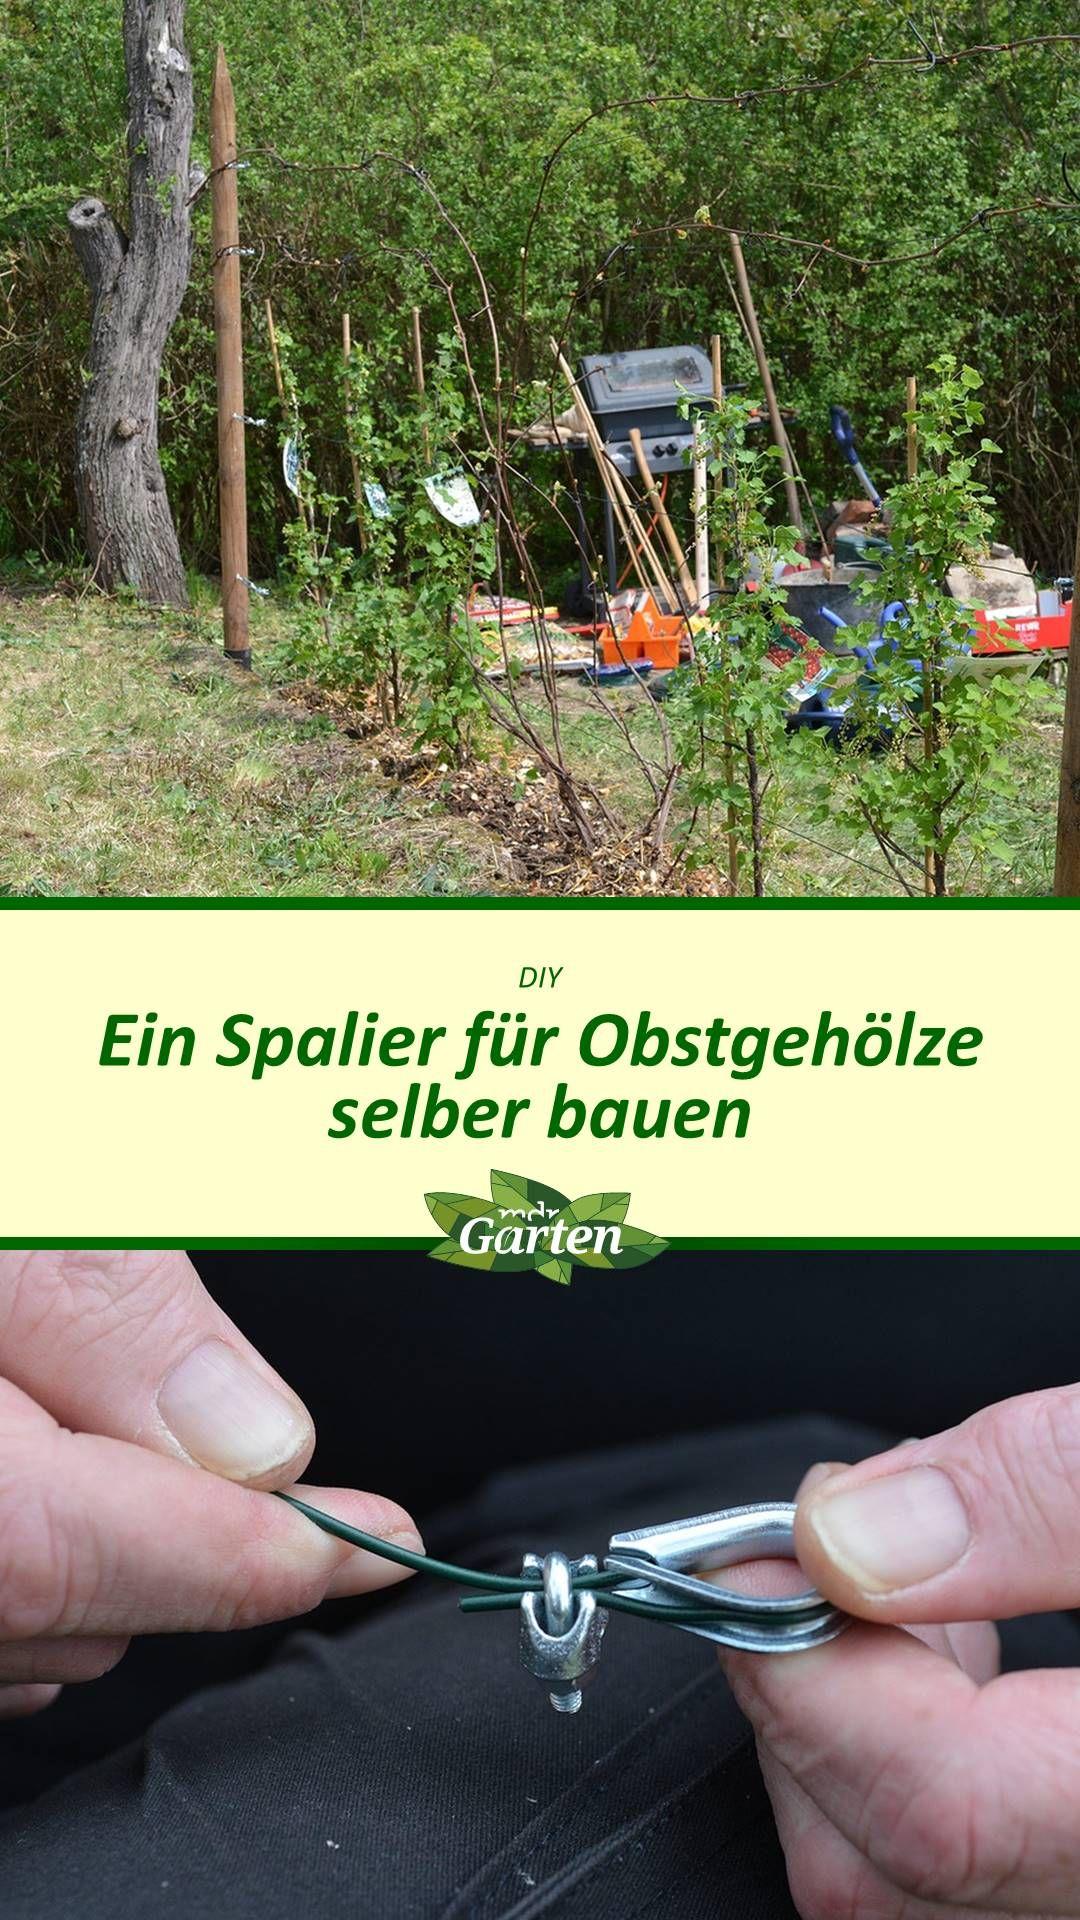 Diy Spalier Bauen Spalier Obstgeholze Mdr Garten